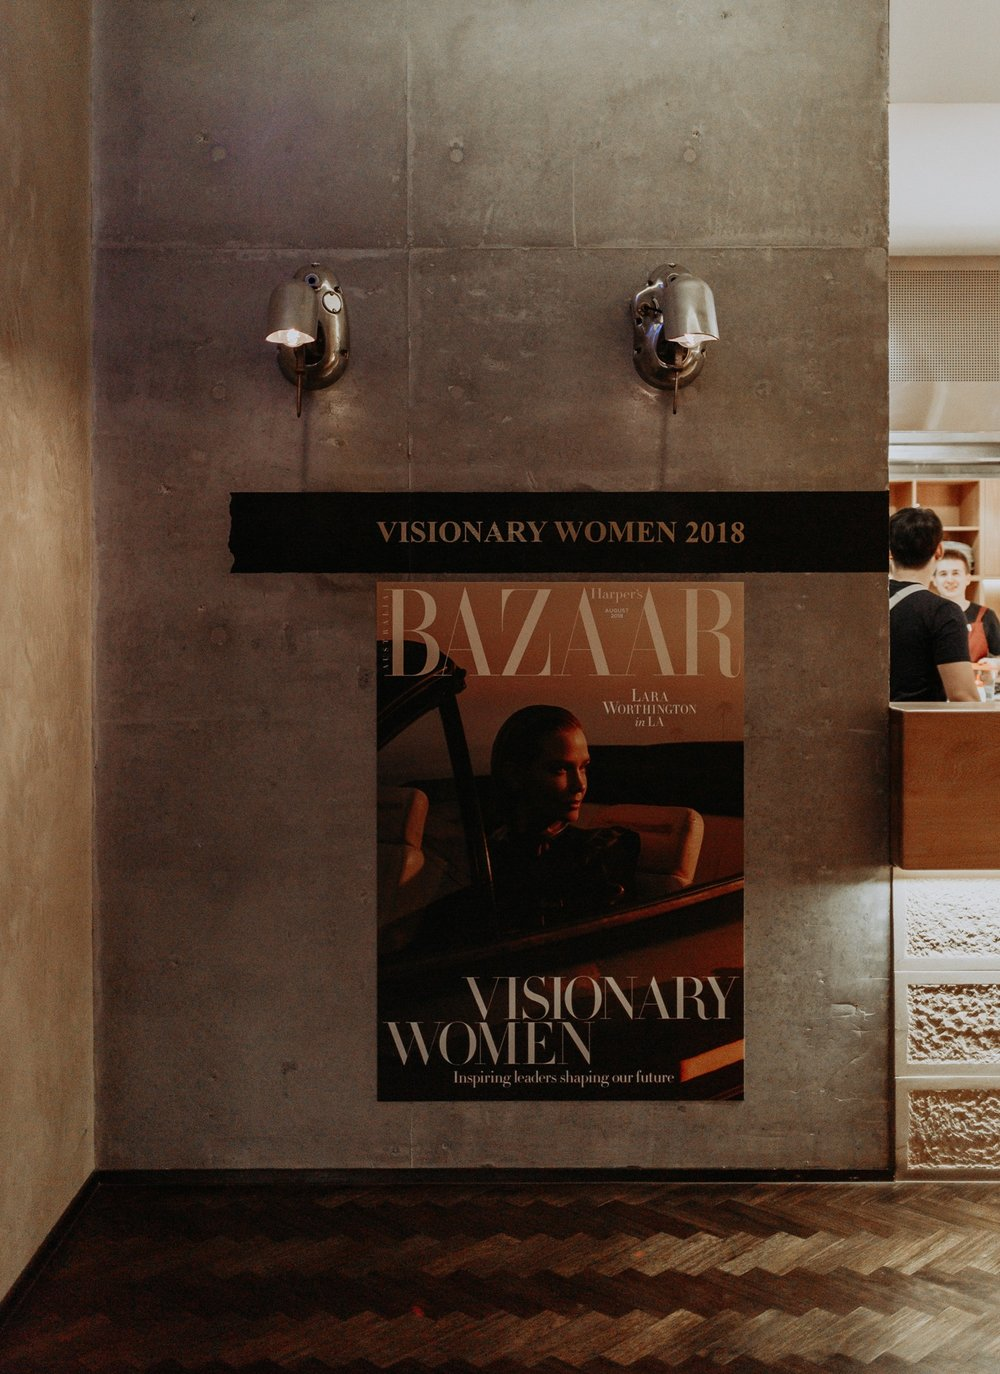 Harper's Bazaar - Visionary Women - Old Clare Hotel, Sydney